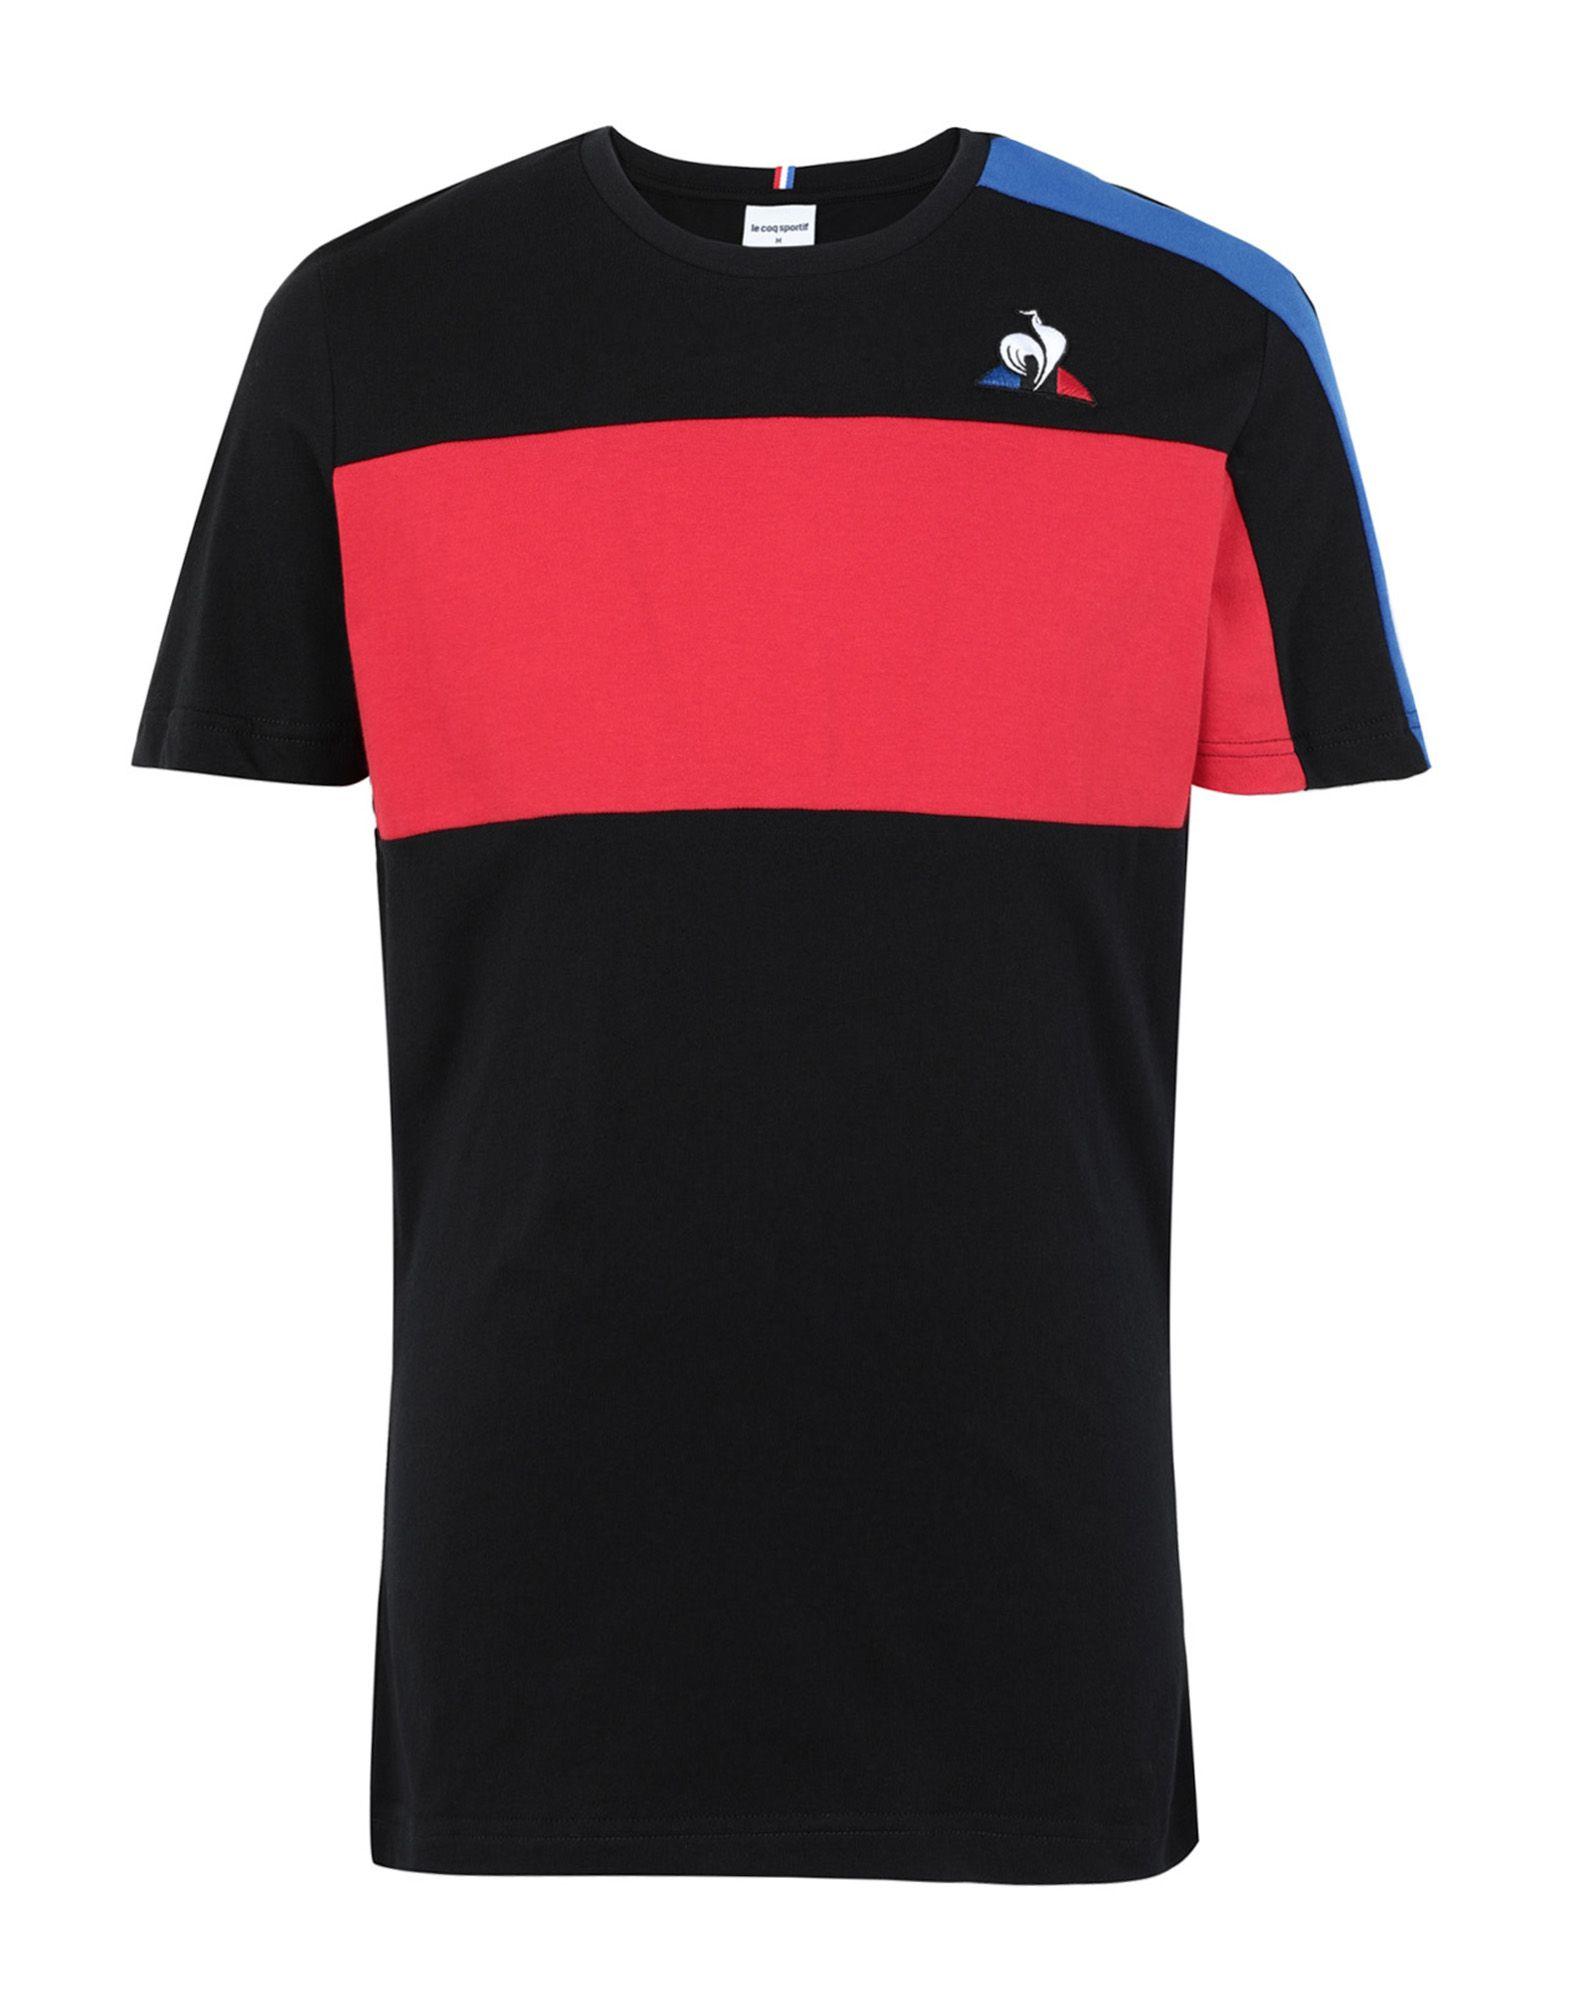 T-Shirt Sportiva Sportiva Sportiva Le Coq Sportif Tri Tee Ss N°6 - uomo - 12345820DW 08c